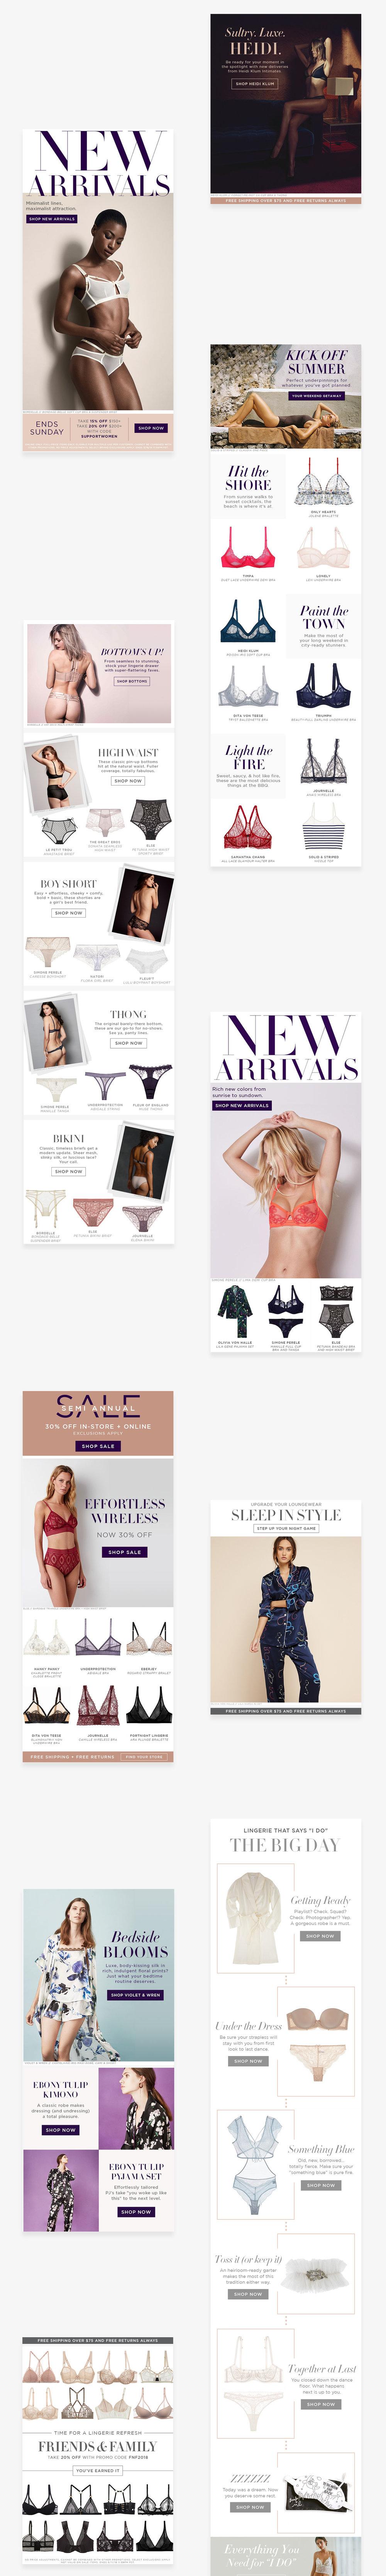 Journelle-email-newsletter-design-pinterest-nyc-fashion-lingerie-heather-maehr.jpg